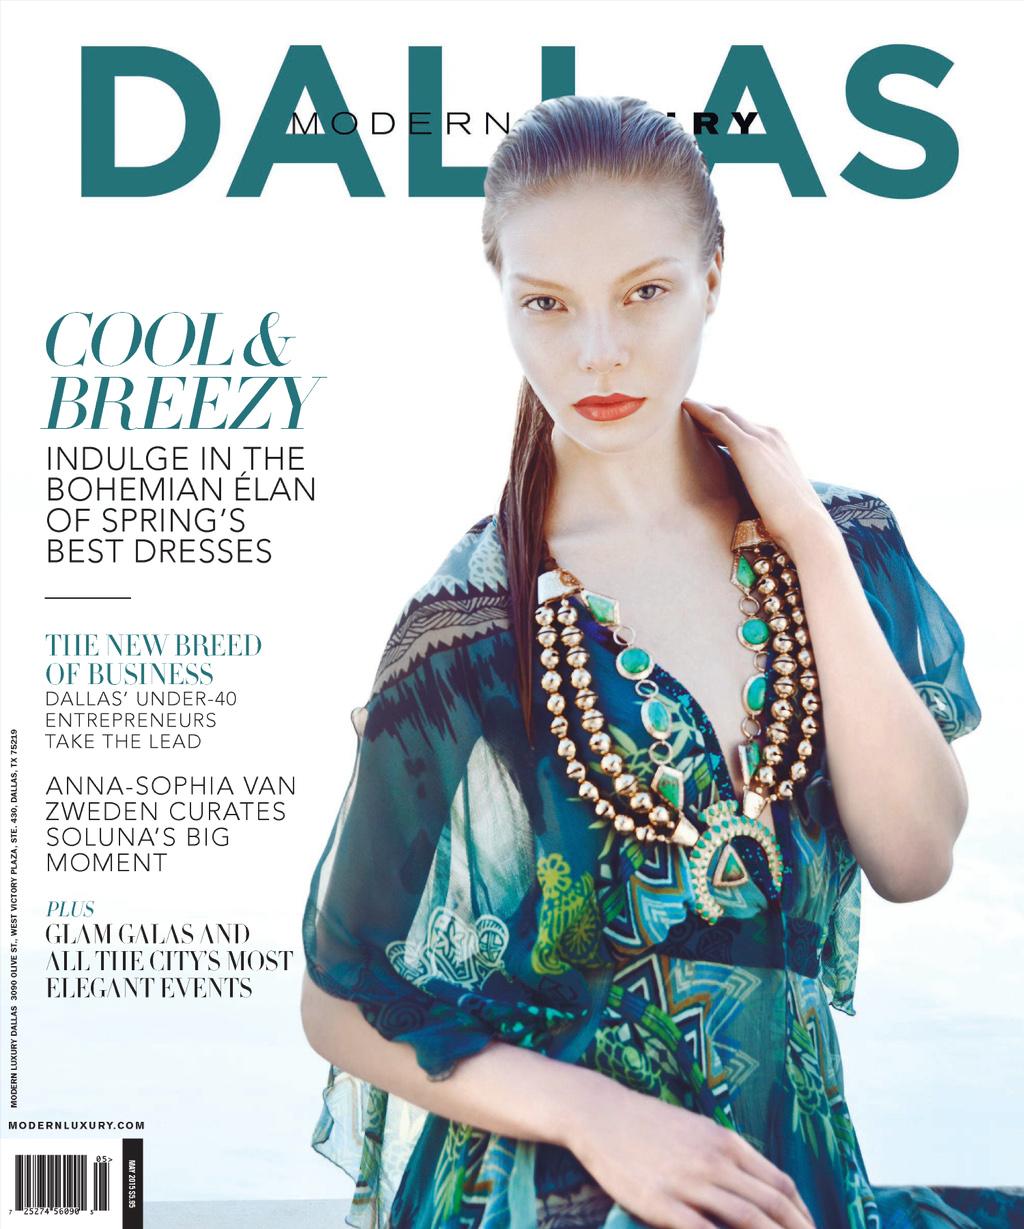 Dallas Modern Luxury EMBREE & LAKE